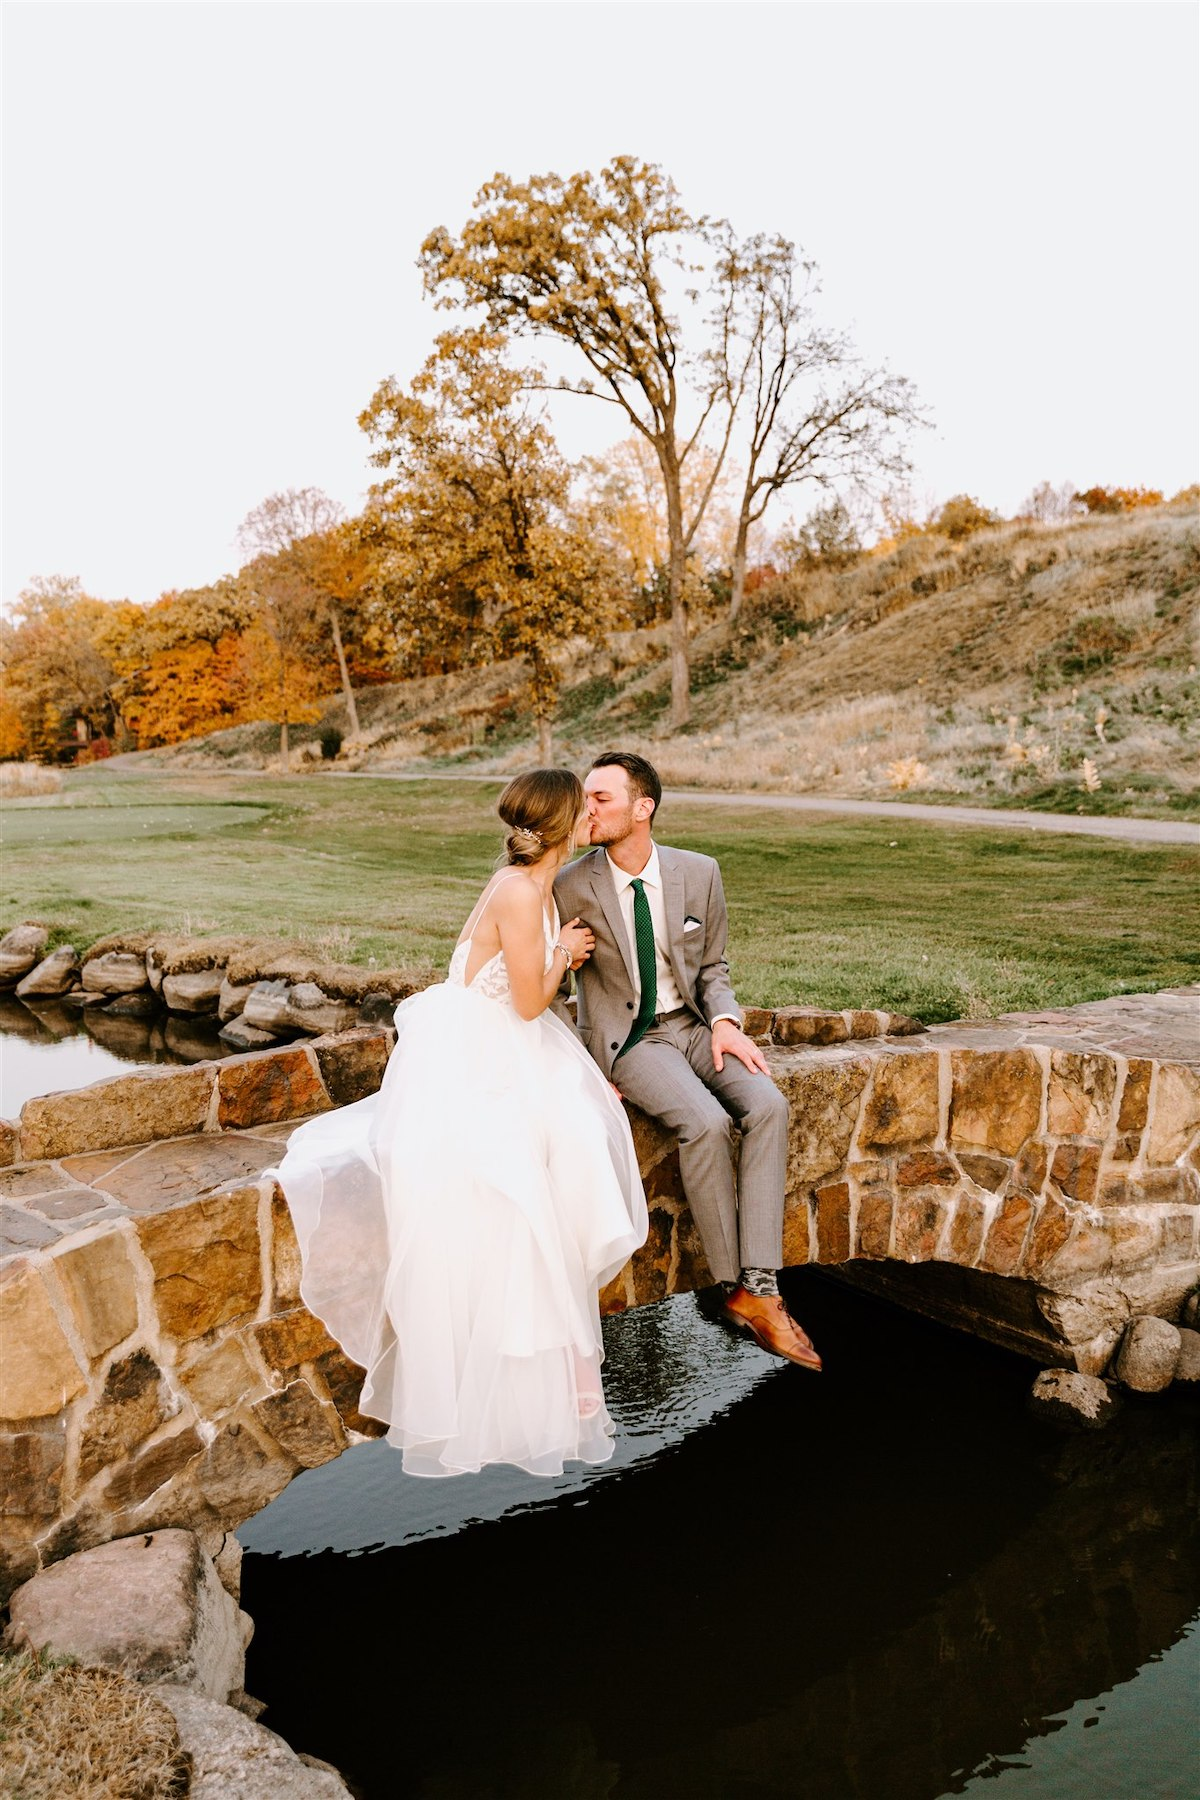 Bride and groom sit on bridge at golf course wedding at Hazeltine National Golf Club in Minnesota